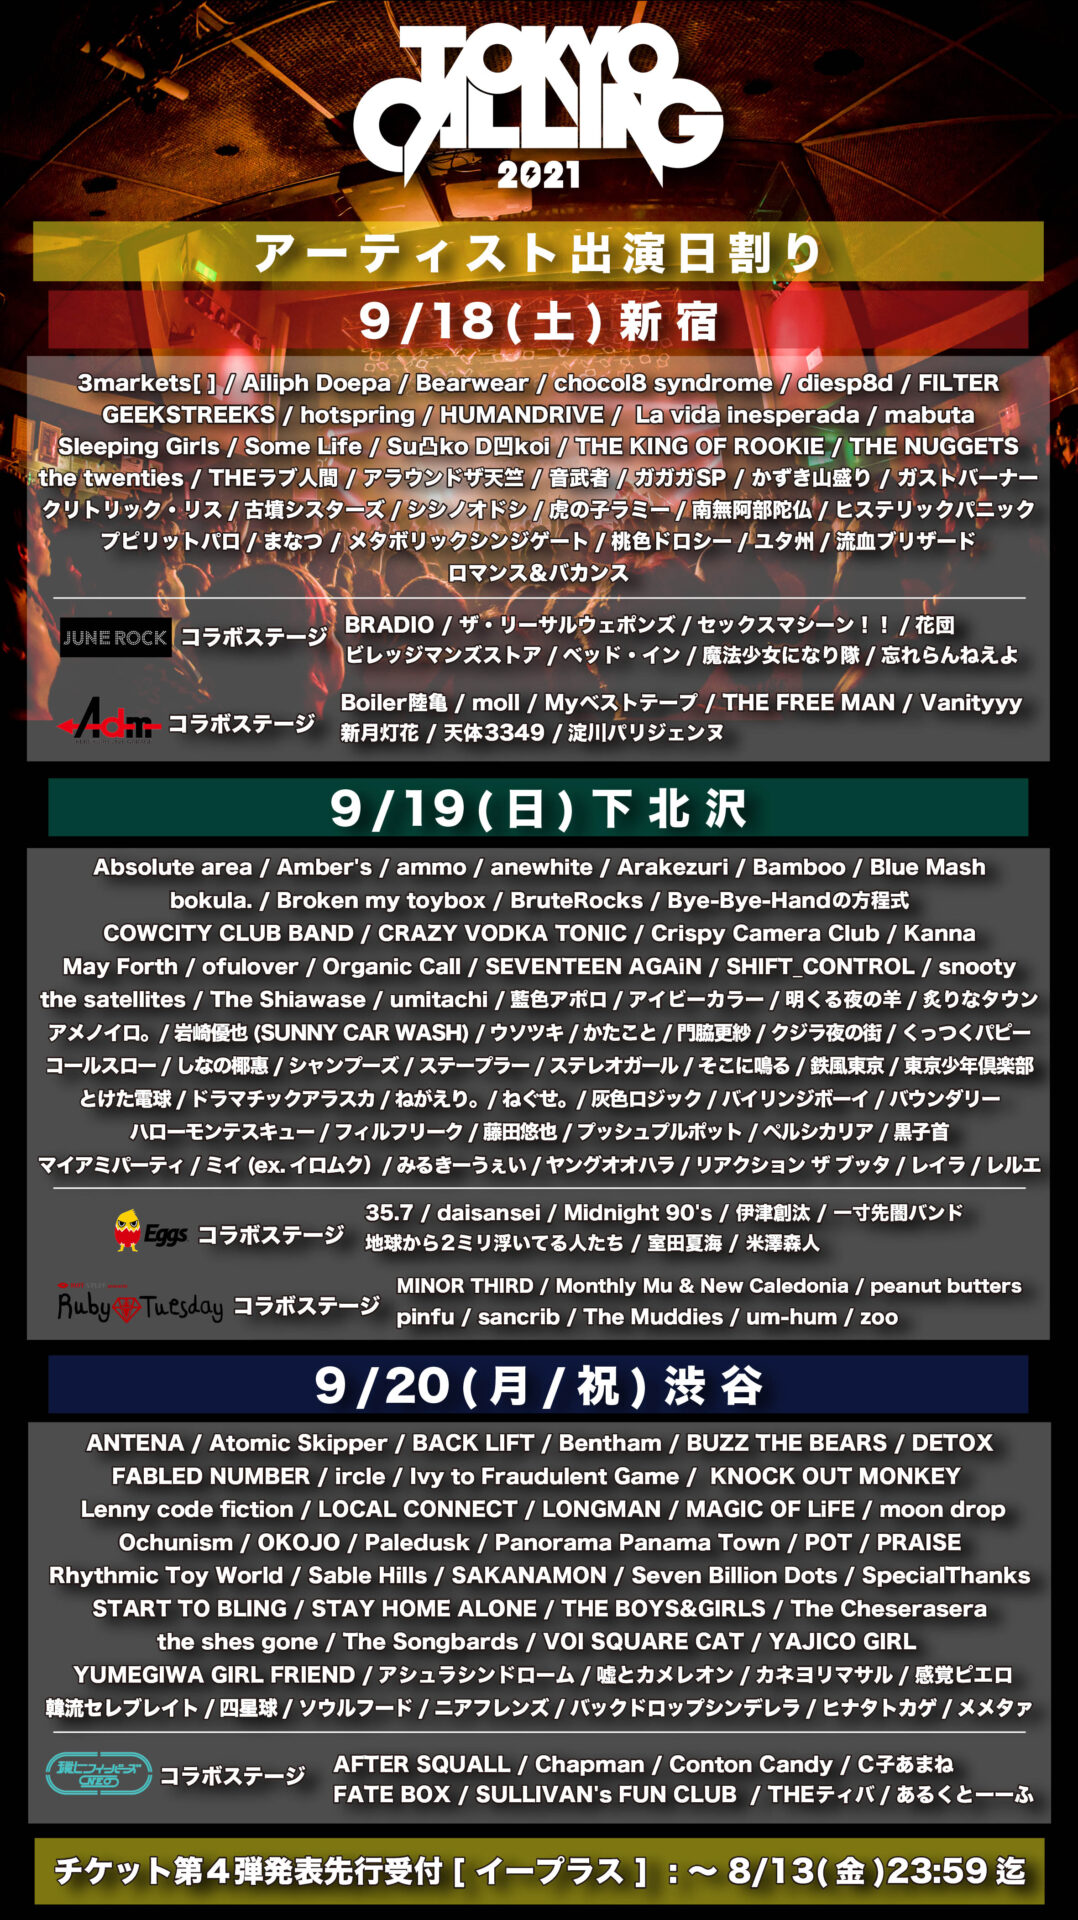 TOKYO CALLING 2021